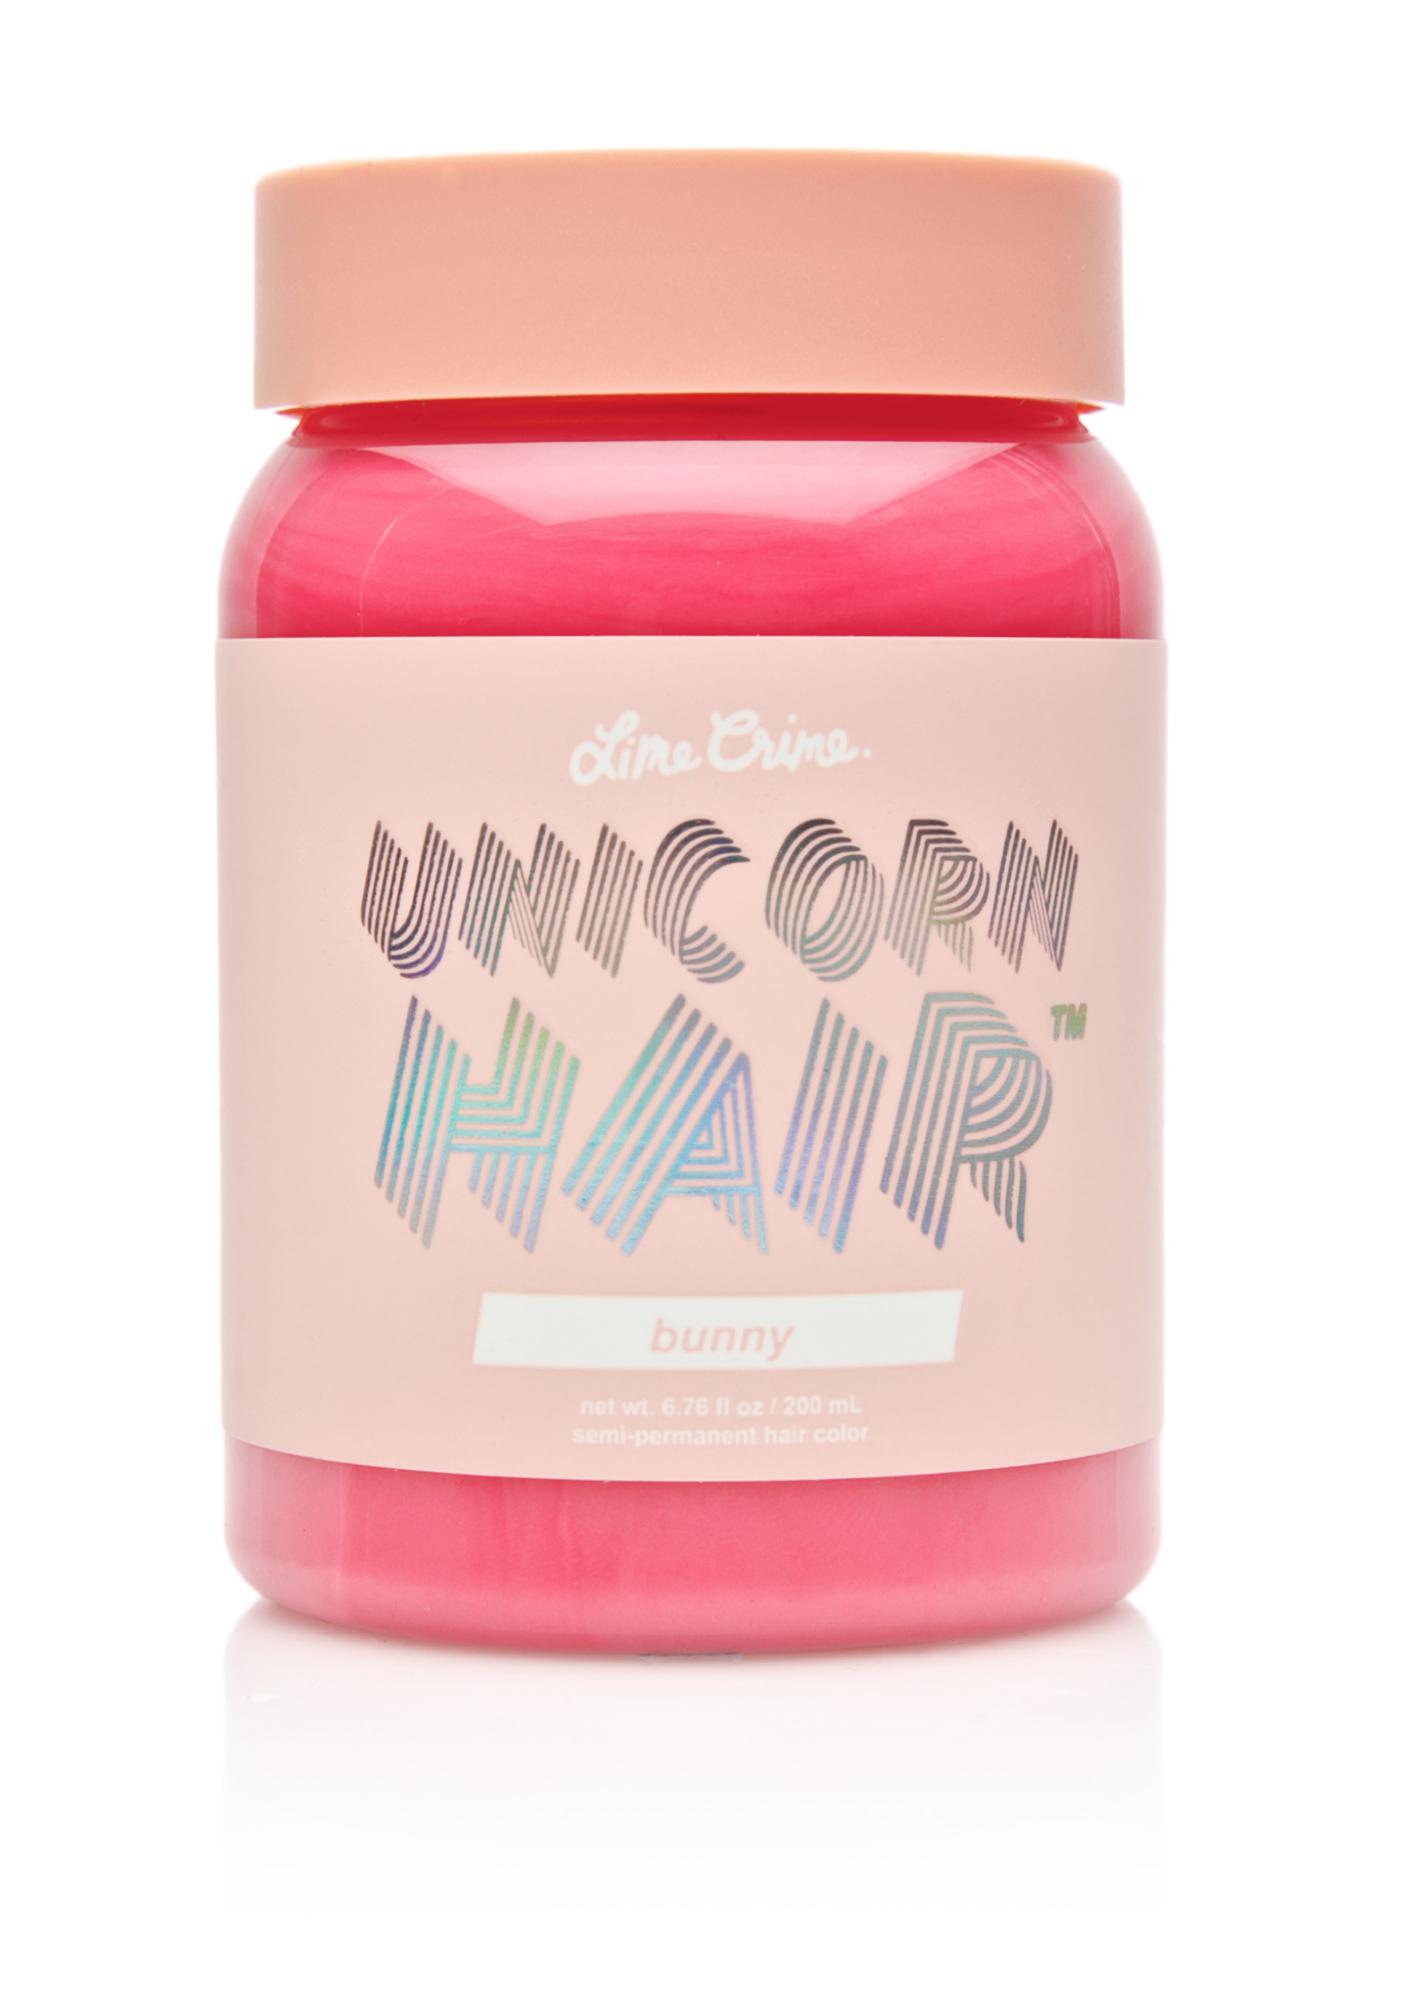 Lime Crime Bunny Unicorn Hair Dye